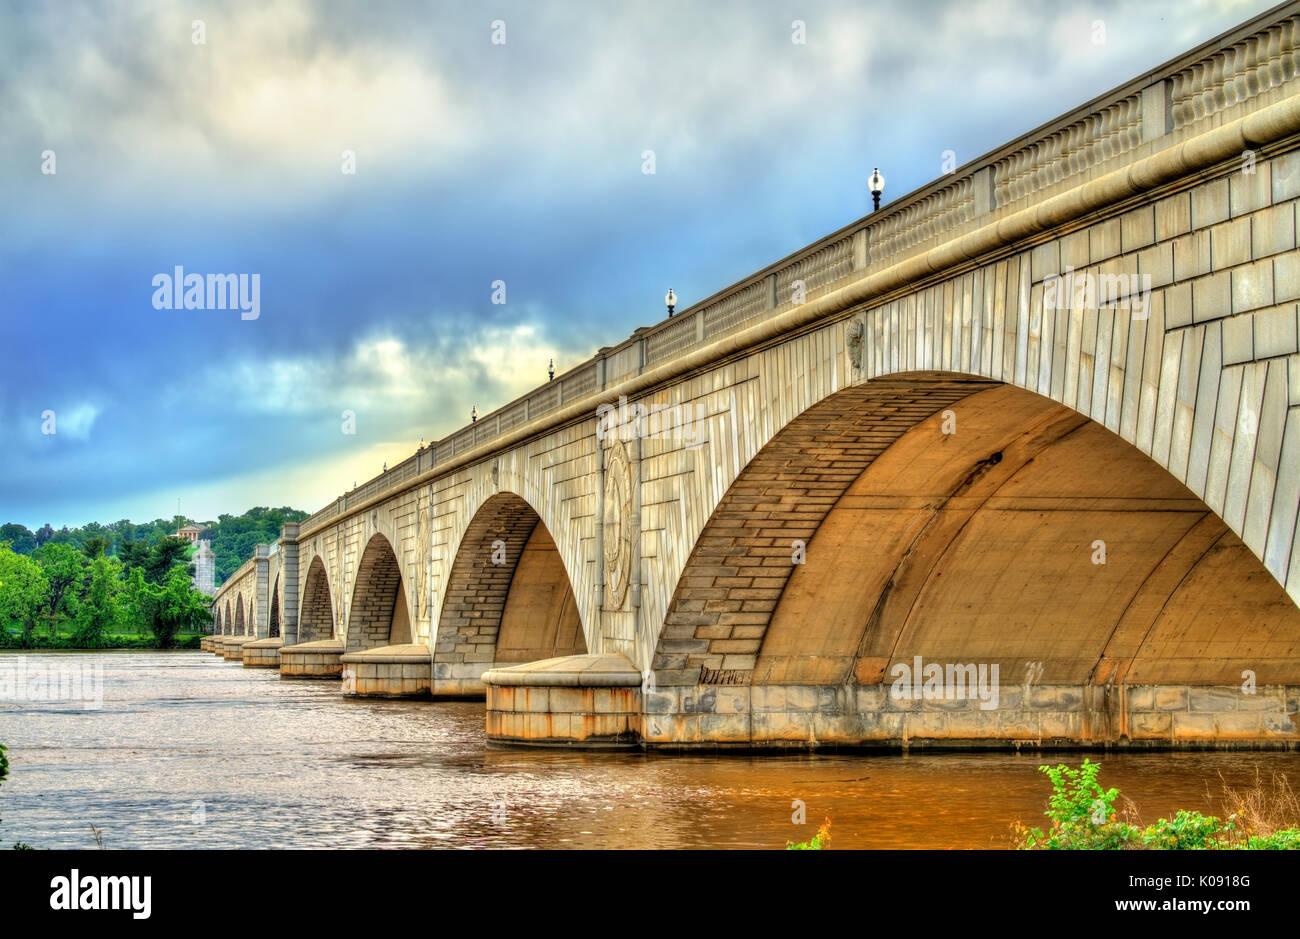 Arlington Memorial Bridge Stock Photos & Arlington Memorial Bridge ...